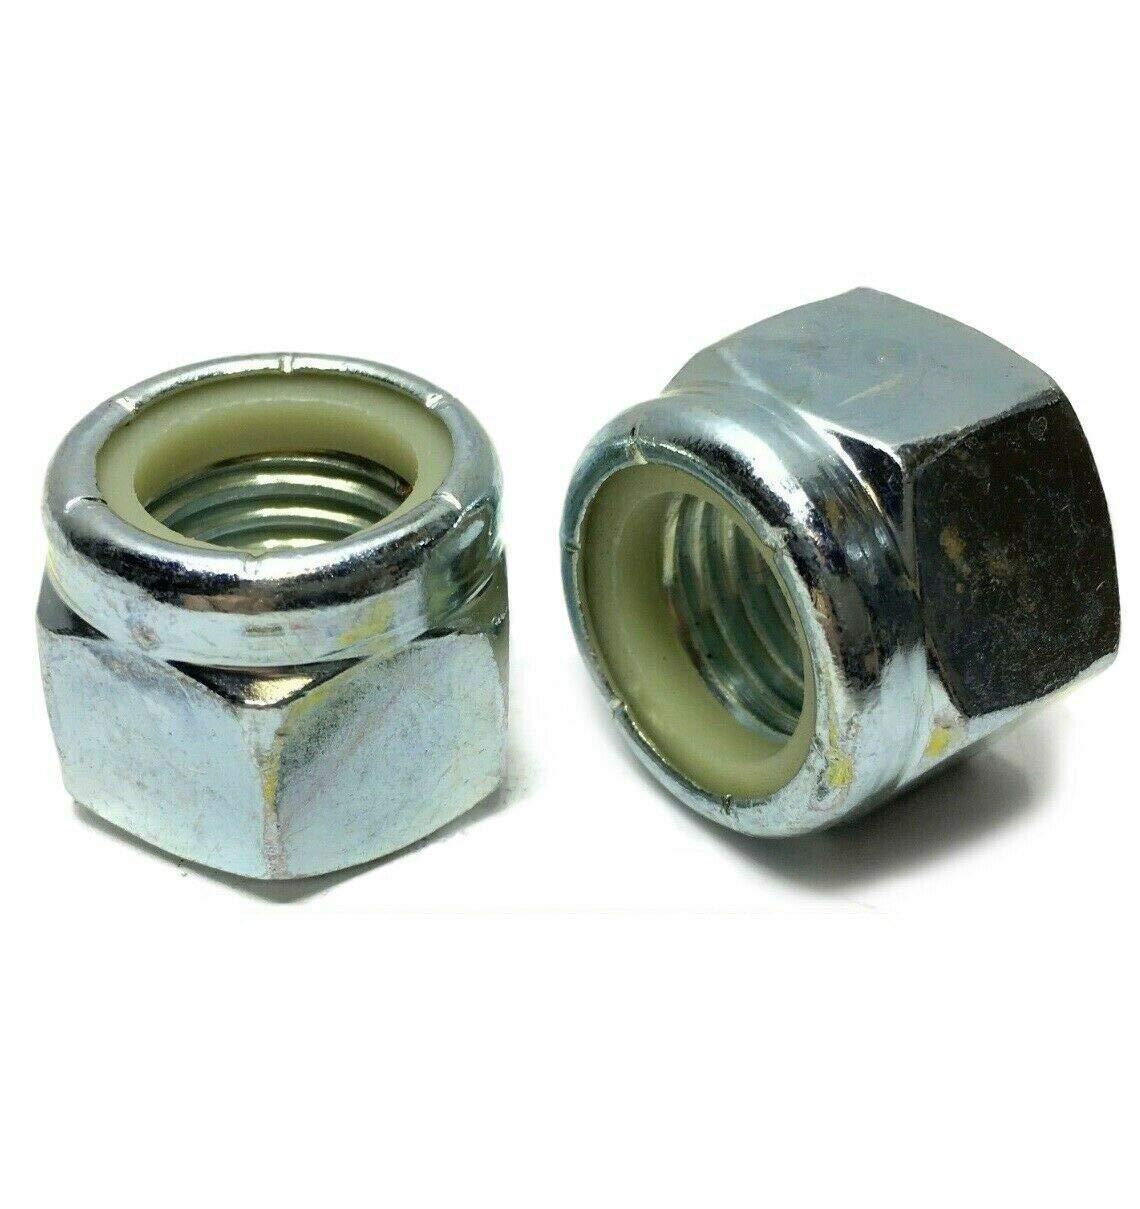 hex Nuts 7 8-9 - Indefinitely Nylon Insert P Lock 100 Nylock Zinc Plated Alternative dealer